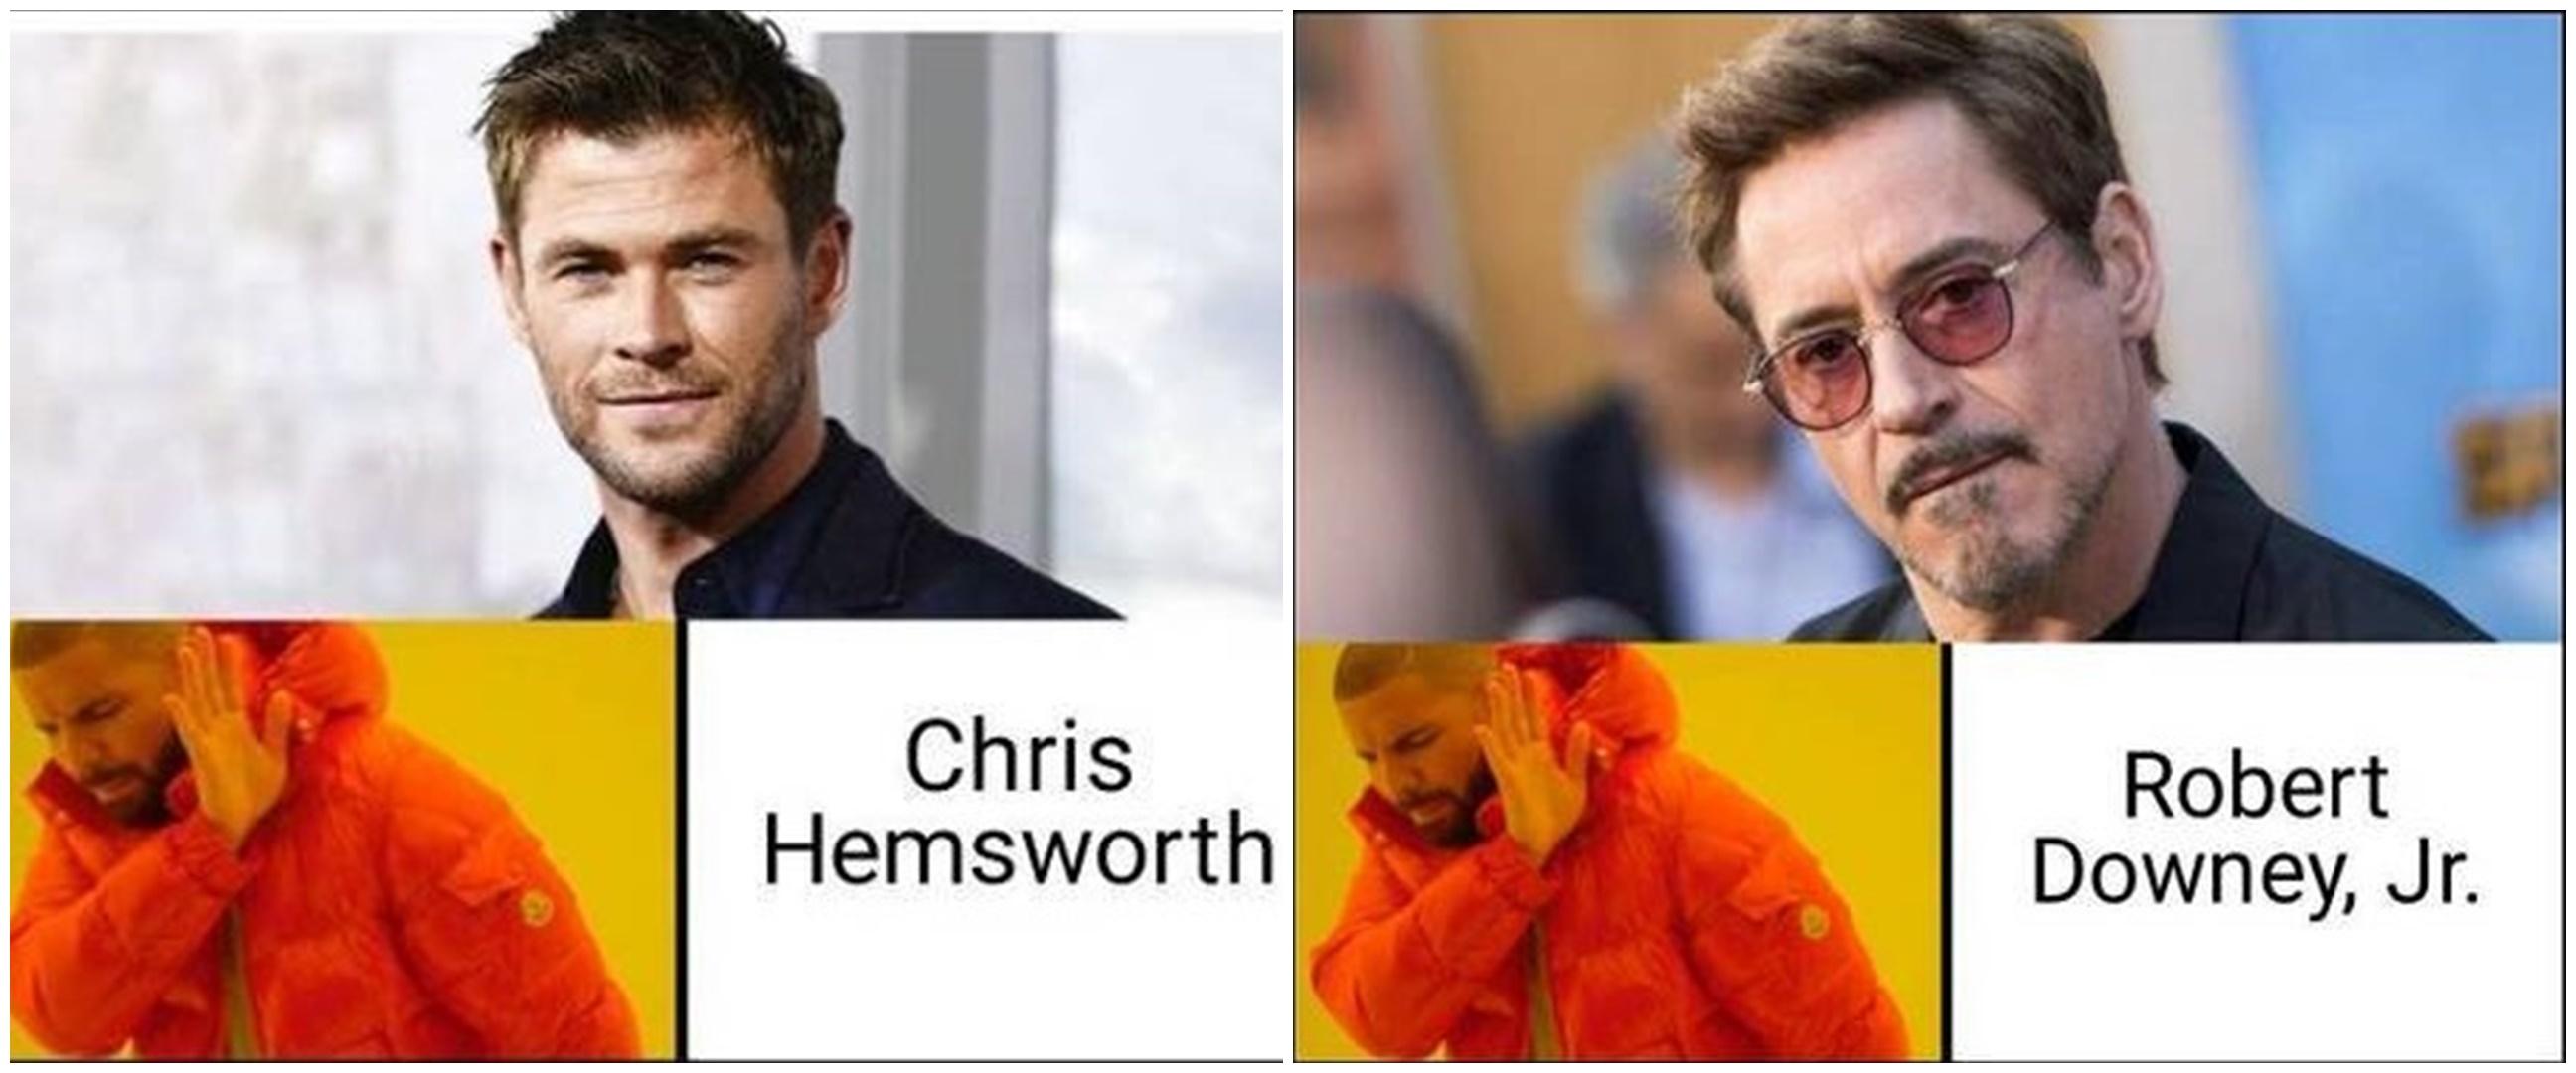 10 Meme nama aktor top dunia ini lucunya bikin ngangguk setuju